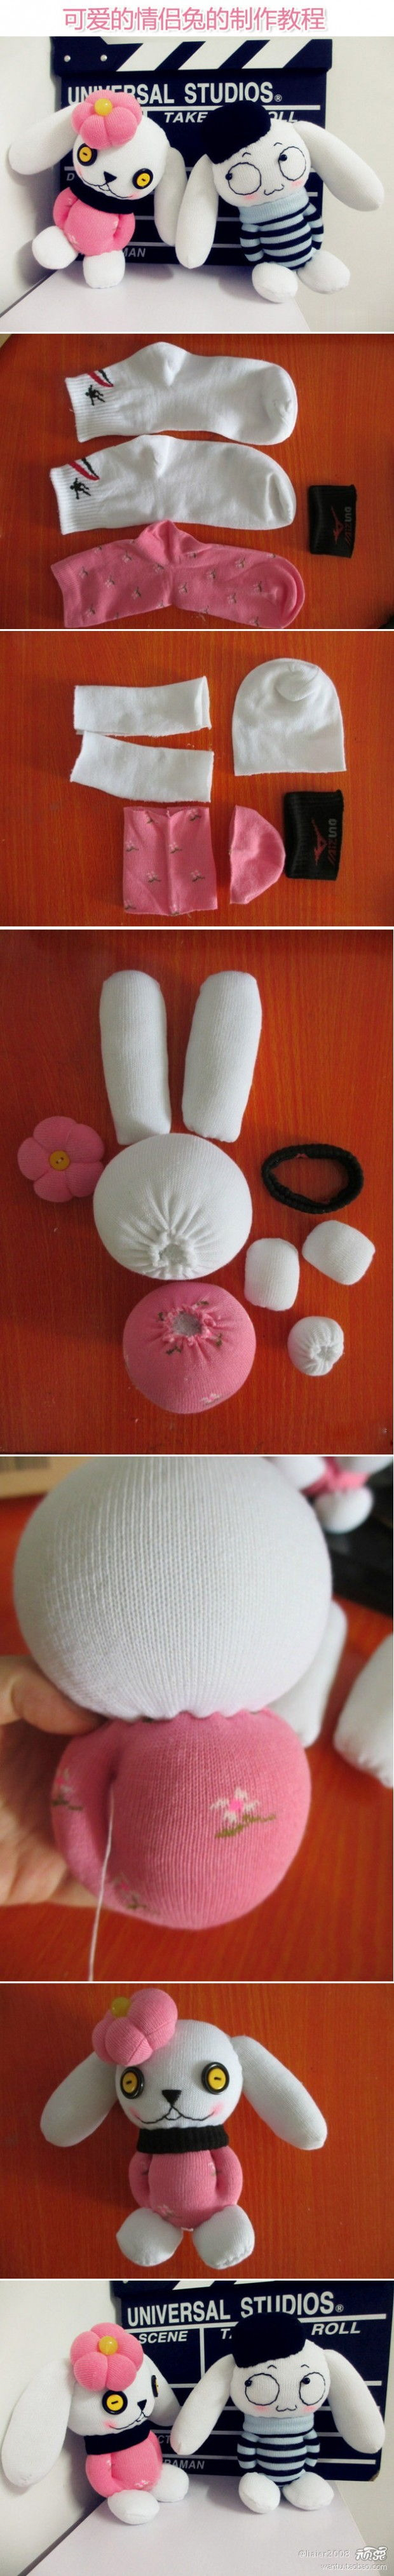 DIY Cute Sock Couple Rabbit Dolls DIY Projects